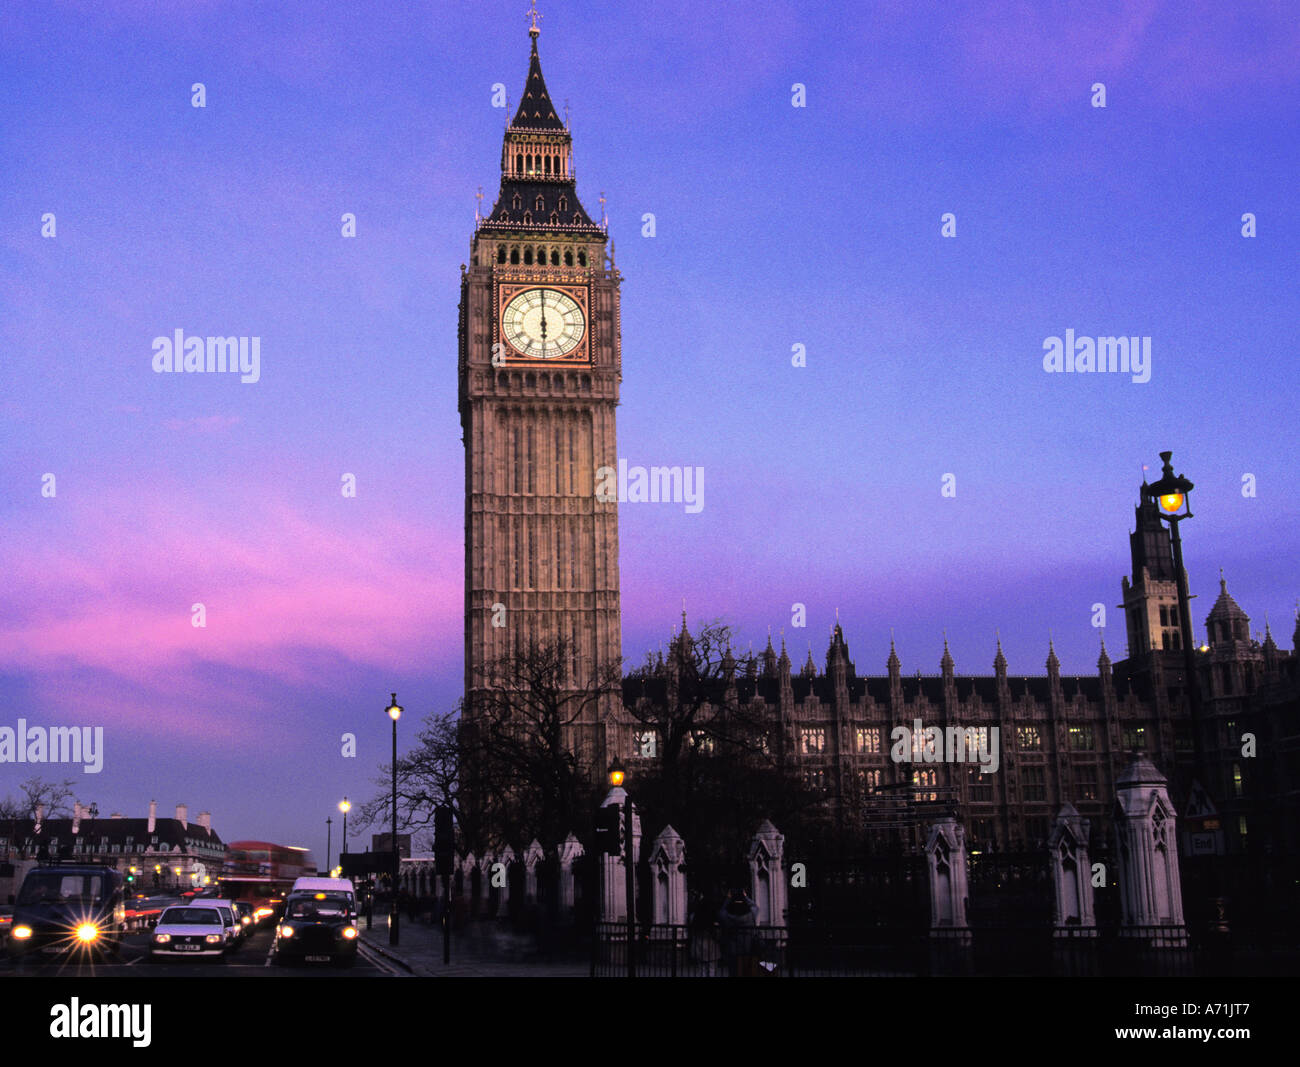 Europe England United Kingdom UK Great Britain Westminster London Big Ben Houses of Parliament at Dusk Europe - Stock Image